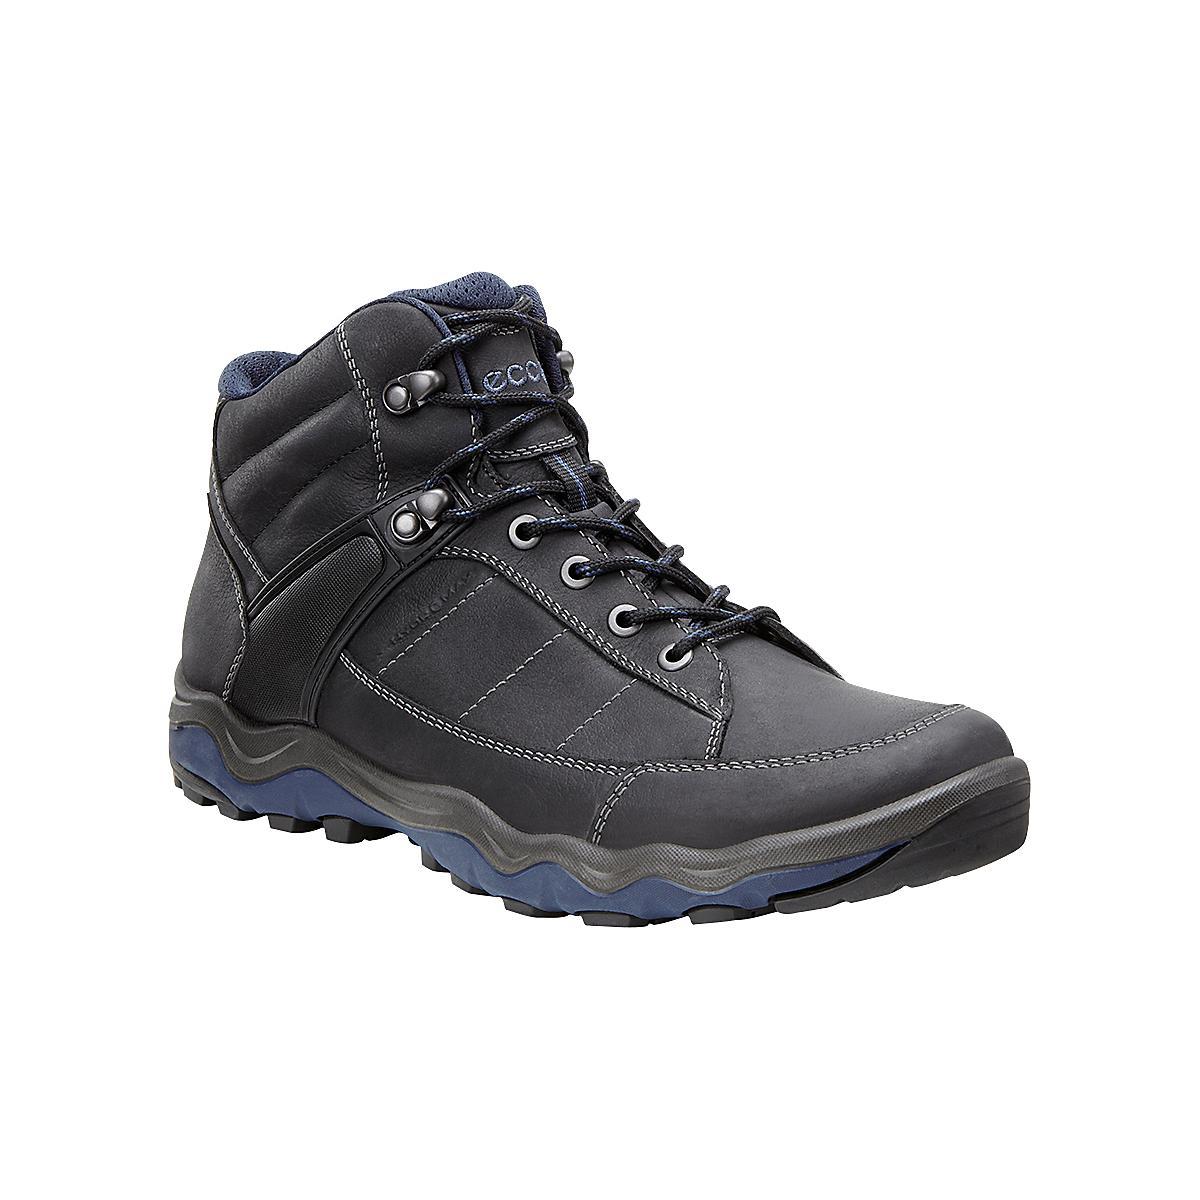 907565df61f9b Mens Ecco Ulterra Dhaka Mid GTX Hiking Shoe at Road Runner Sports